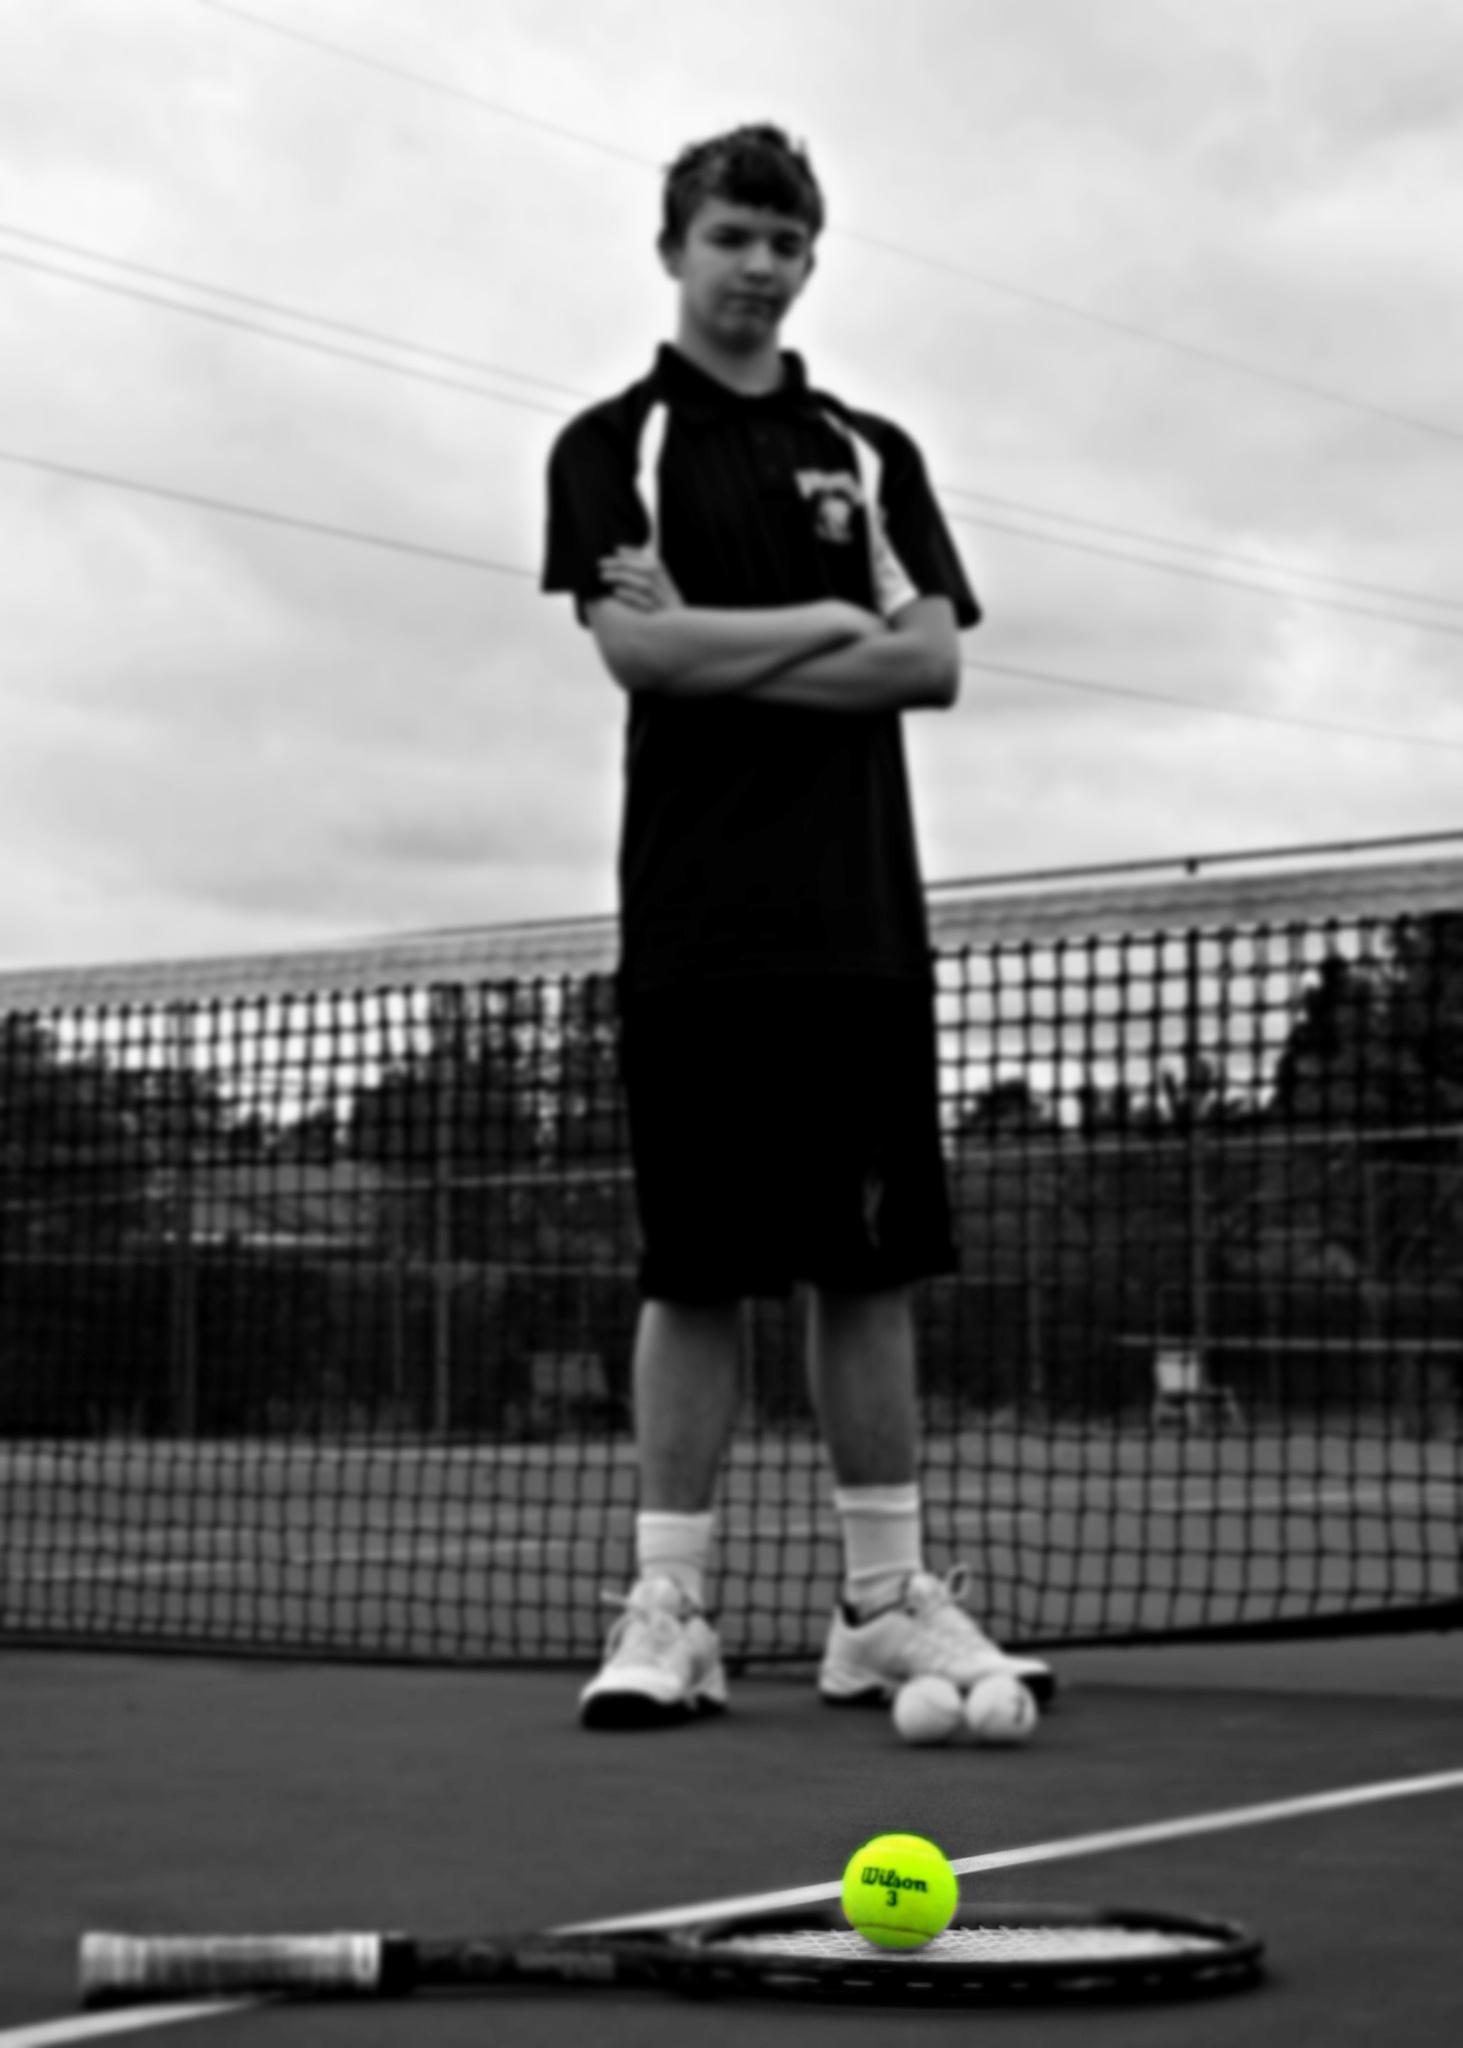 Tennis anyone? by TrishaWeltz